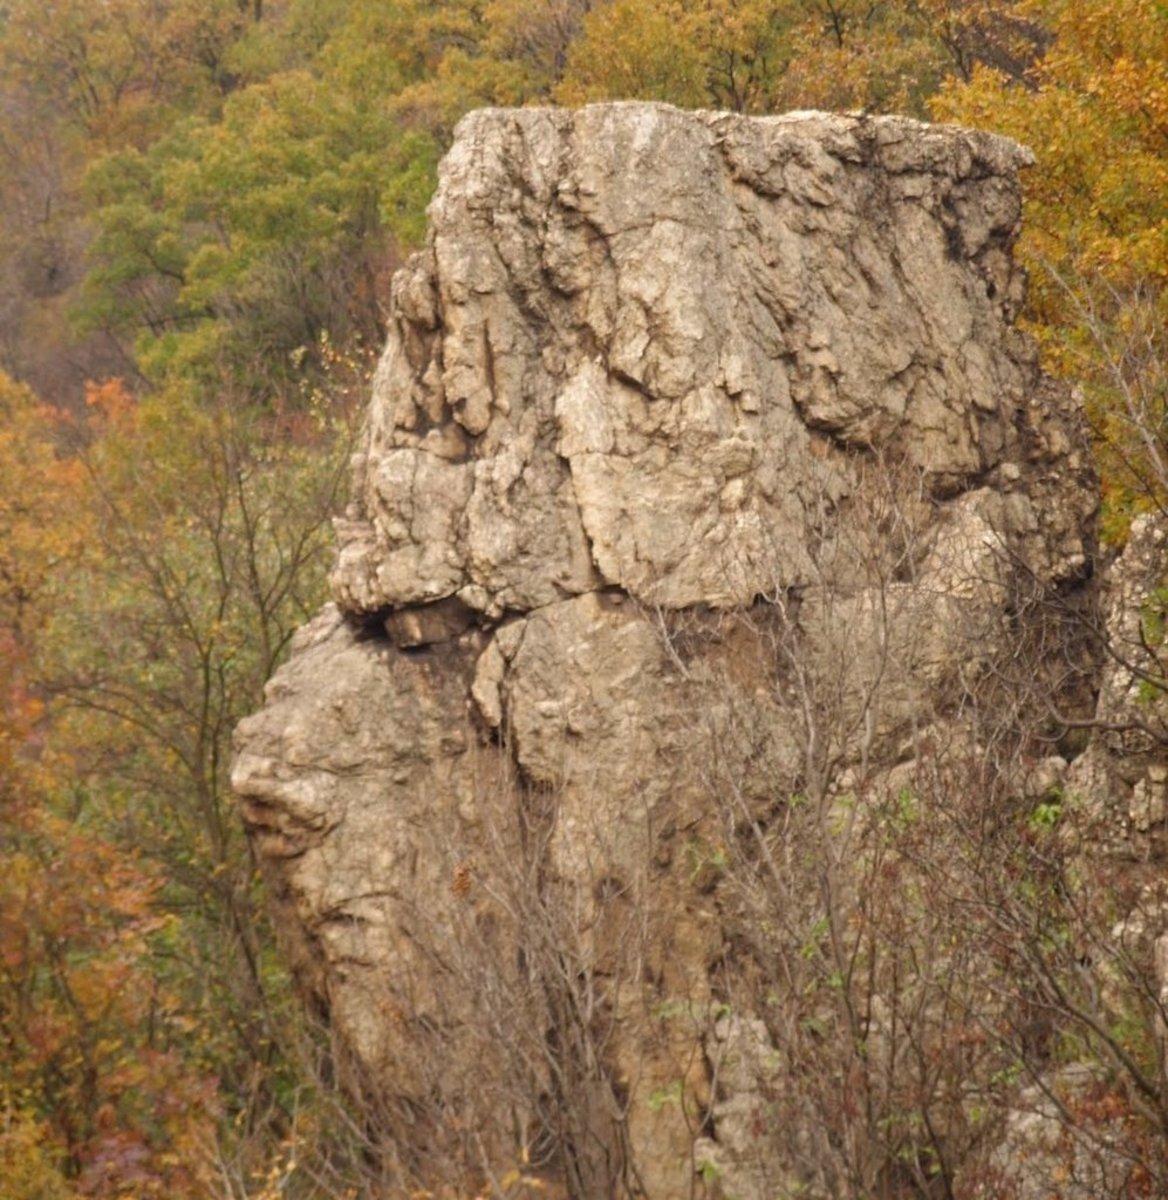 Sphinx located in Banat Romania